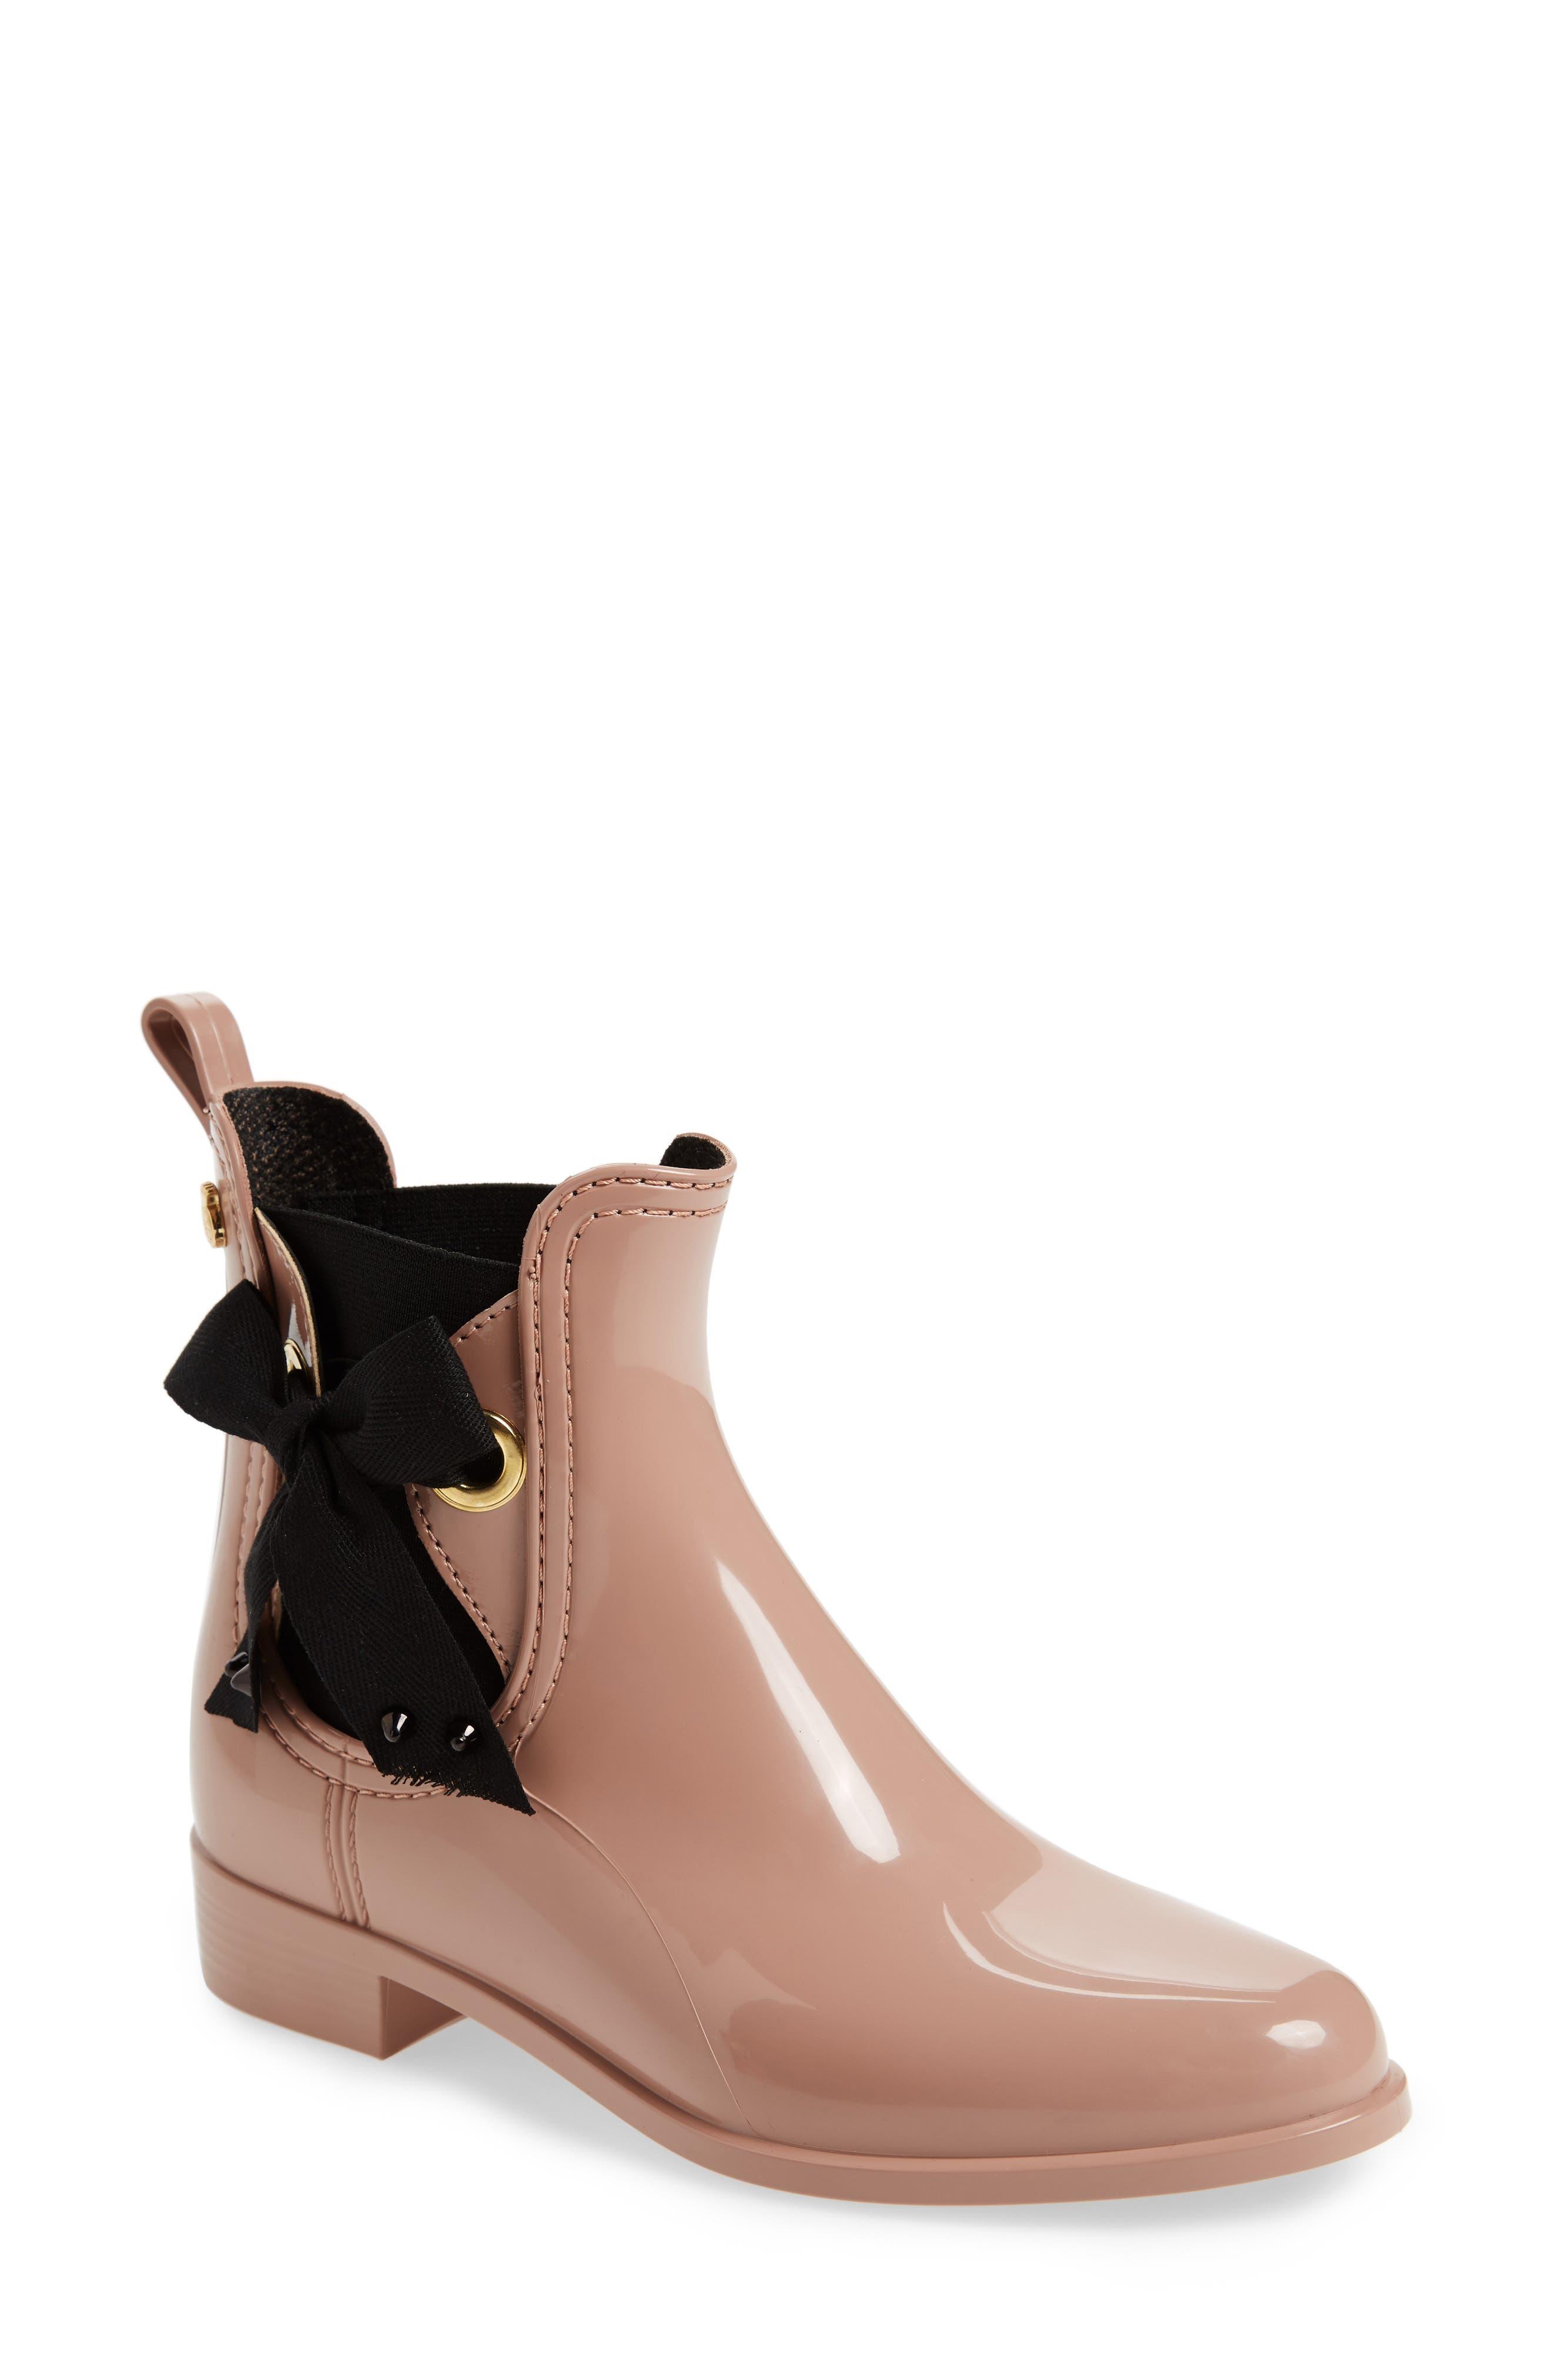 Alternate Image 1 Selected - Lemon Jelly Haley Waterproof Chelsea Boot (Women)